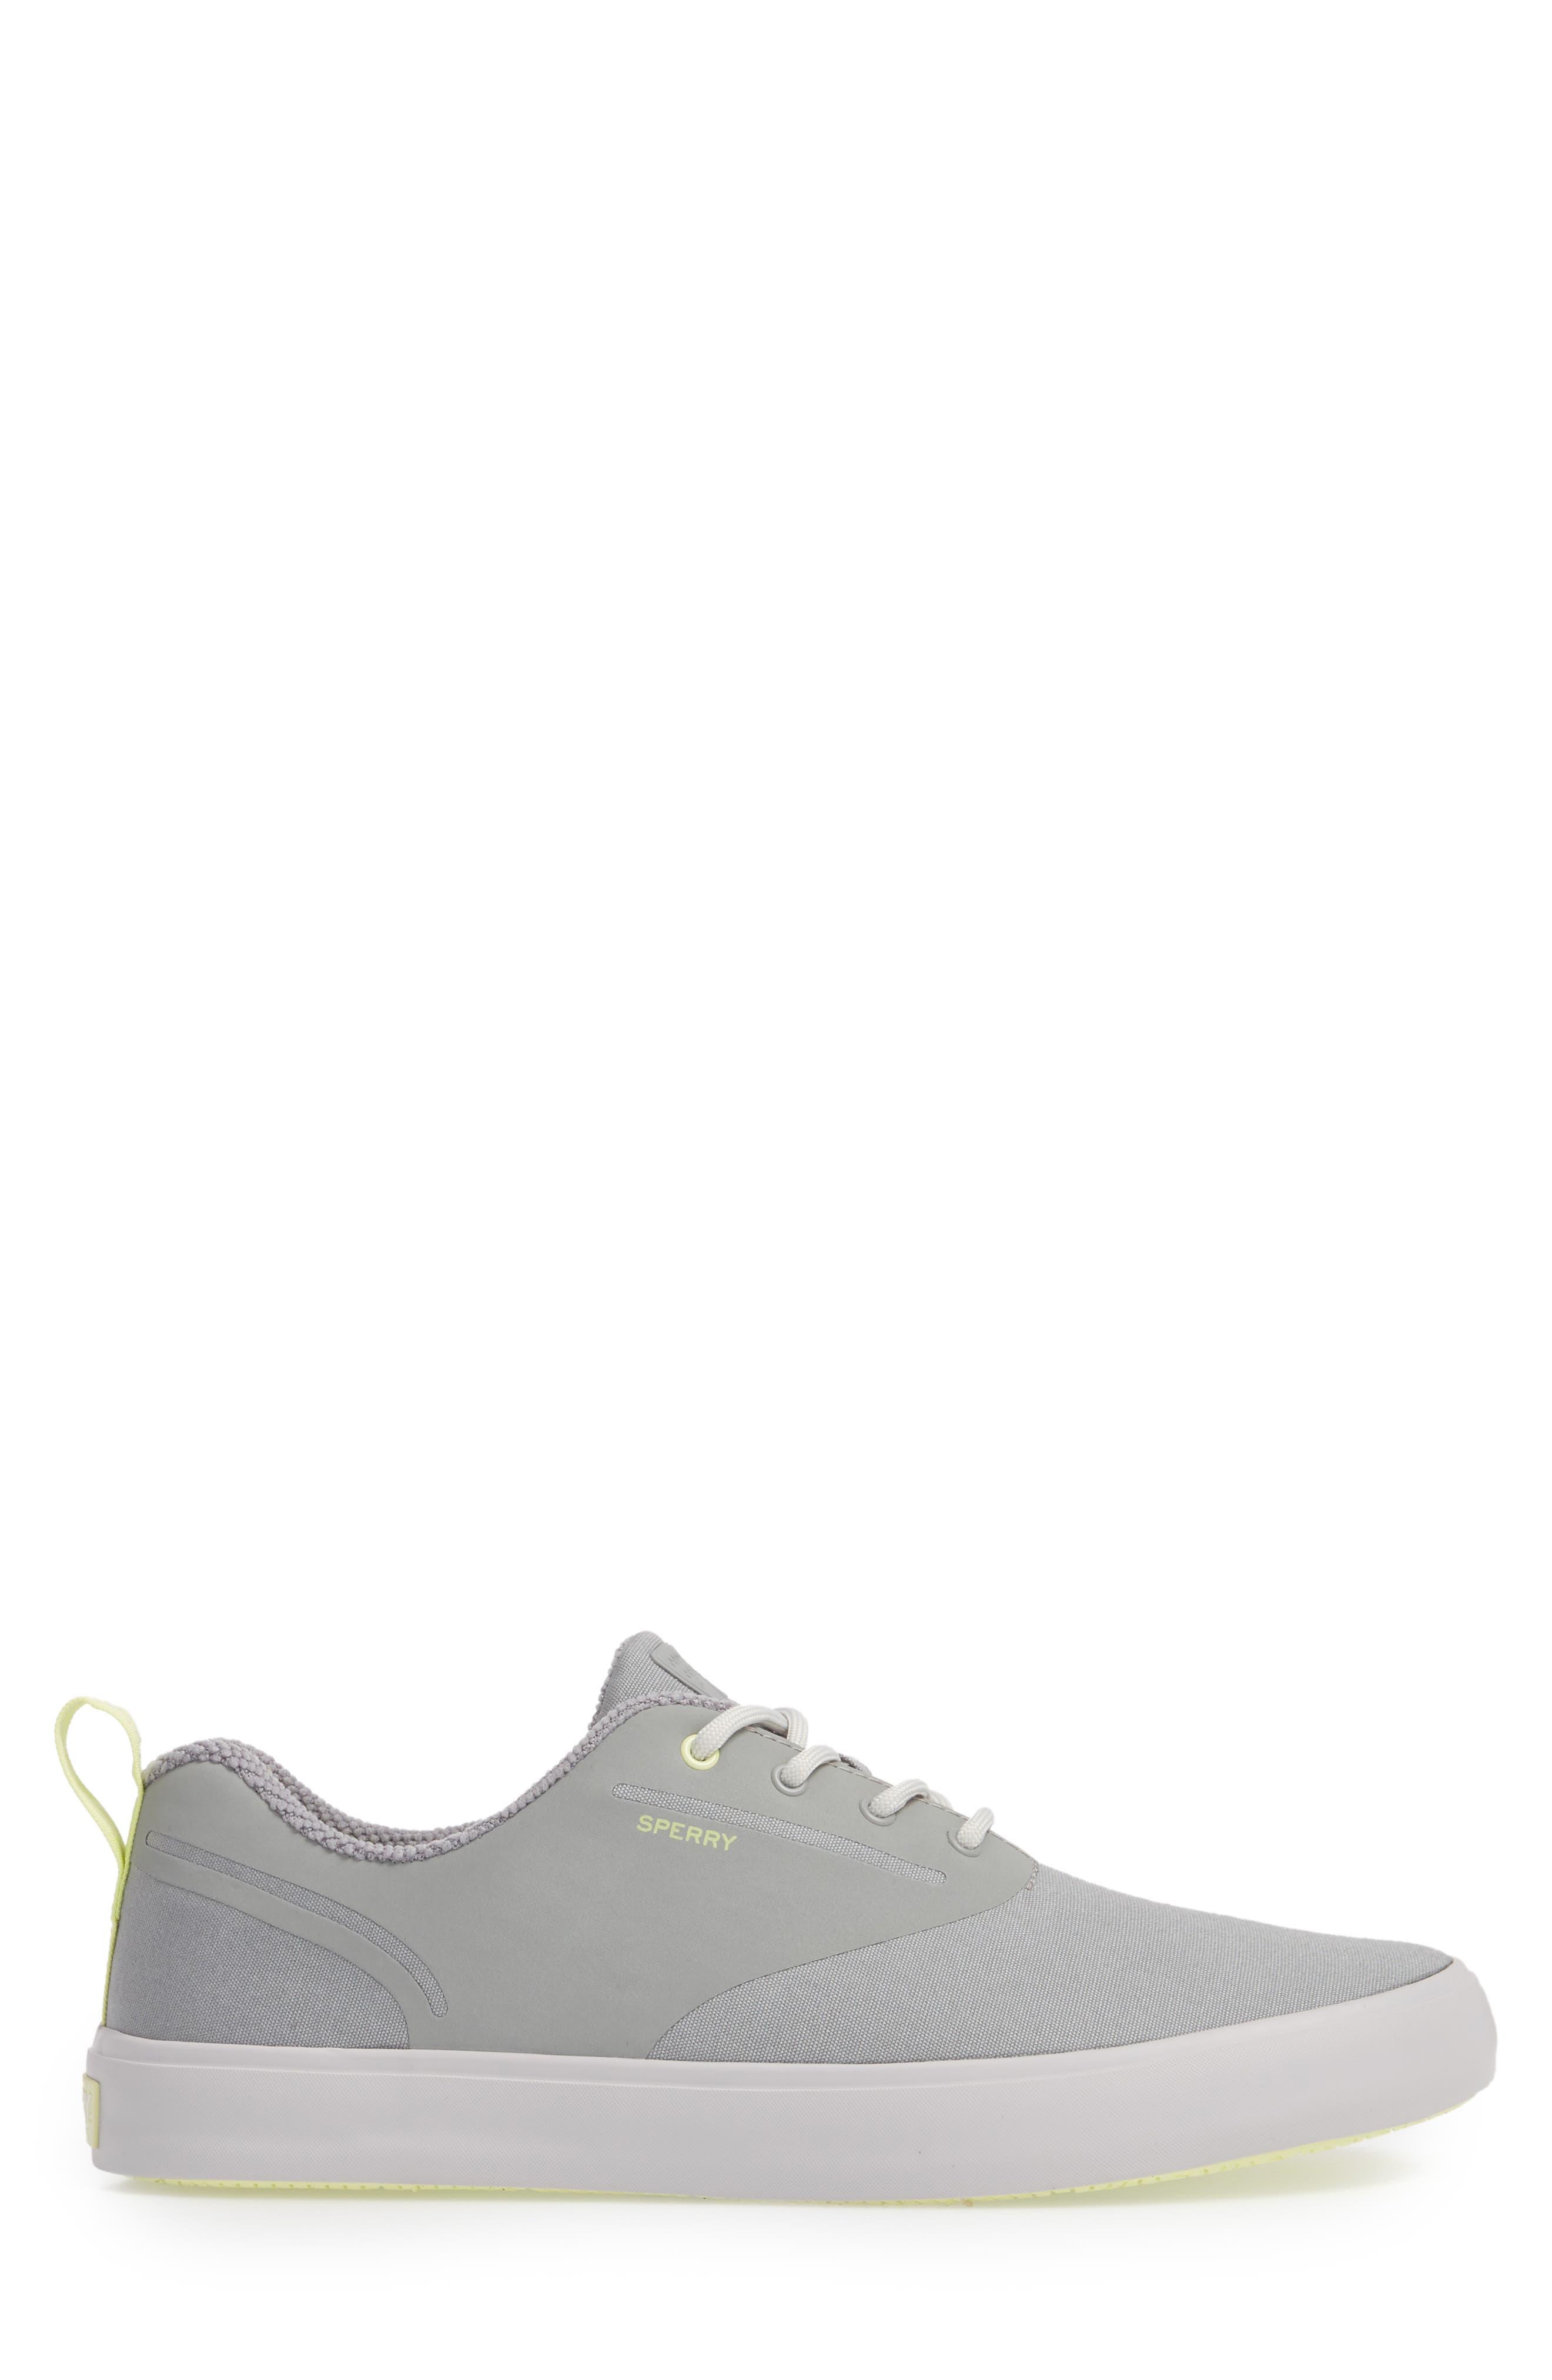 SPERRY, Flex Deck CVO Sneaker, Alternate thumbnail 3, color, GREY